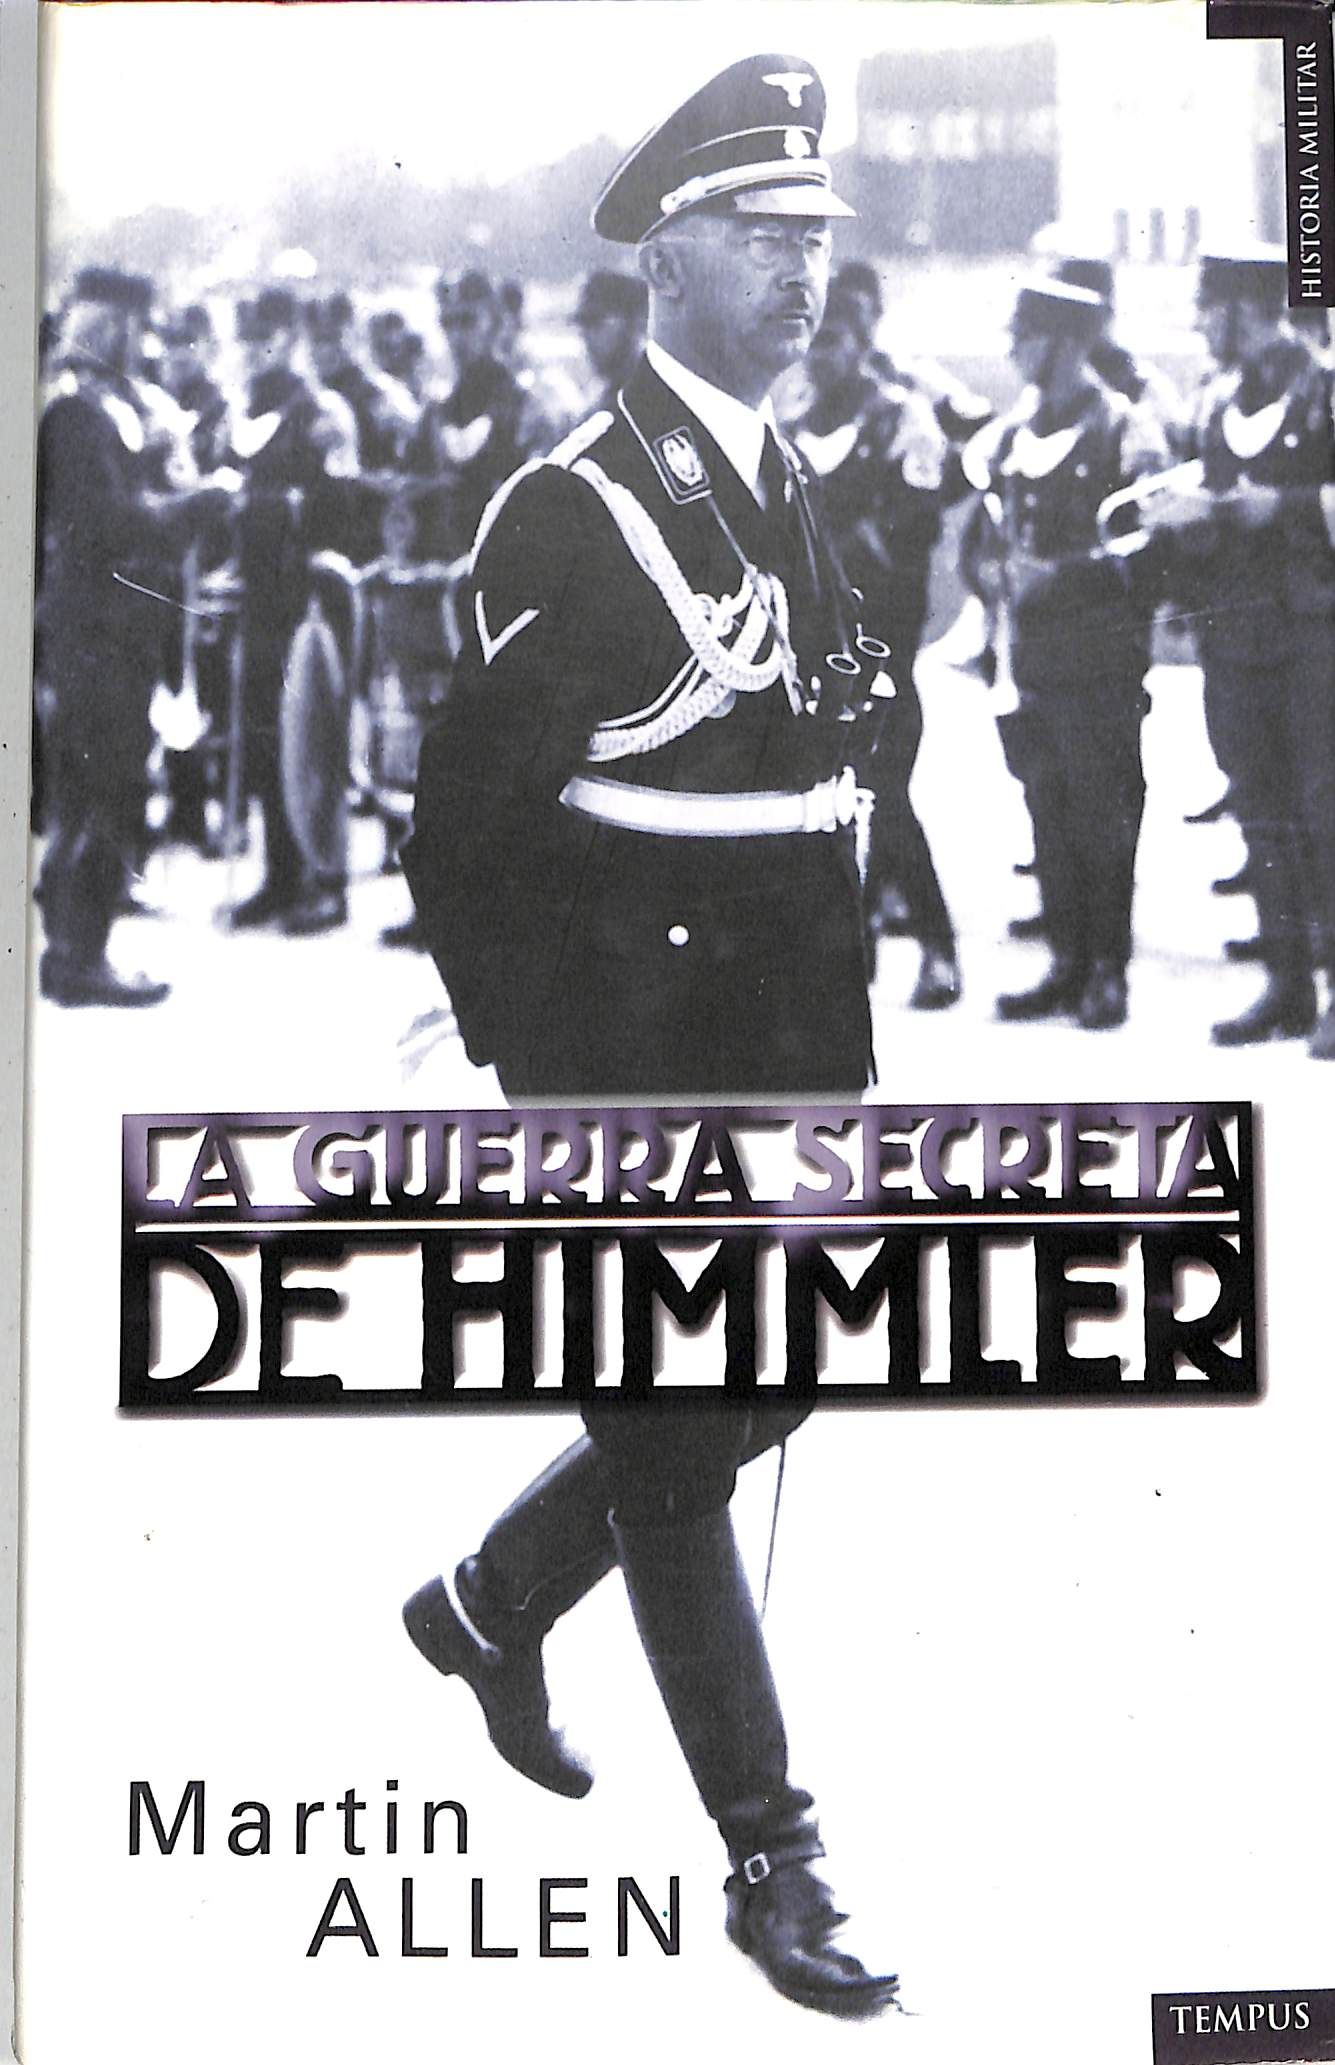 LA GUERRA SECRETA DE HIMMLER - Martin Allen